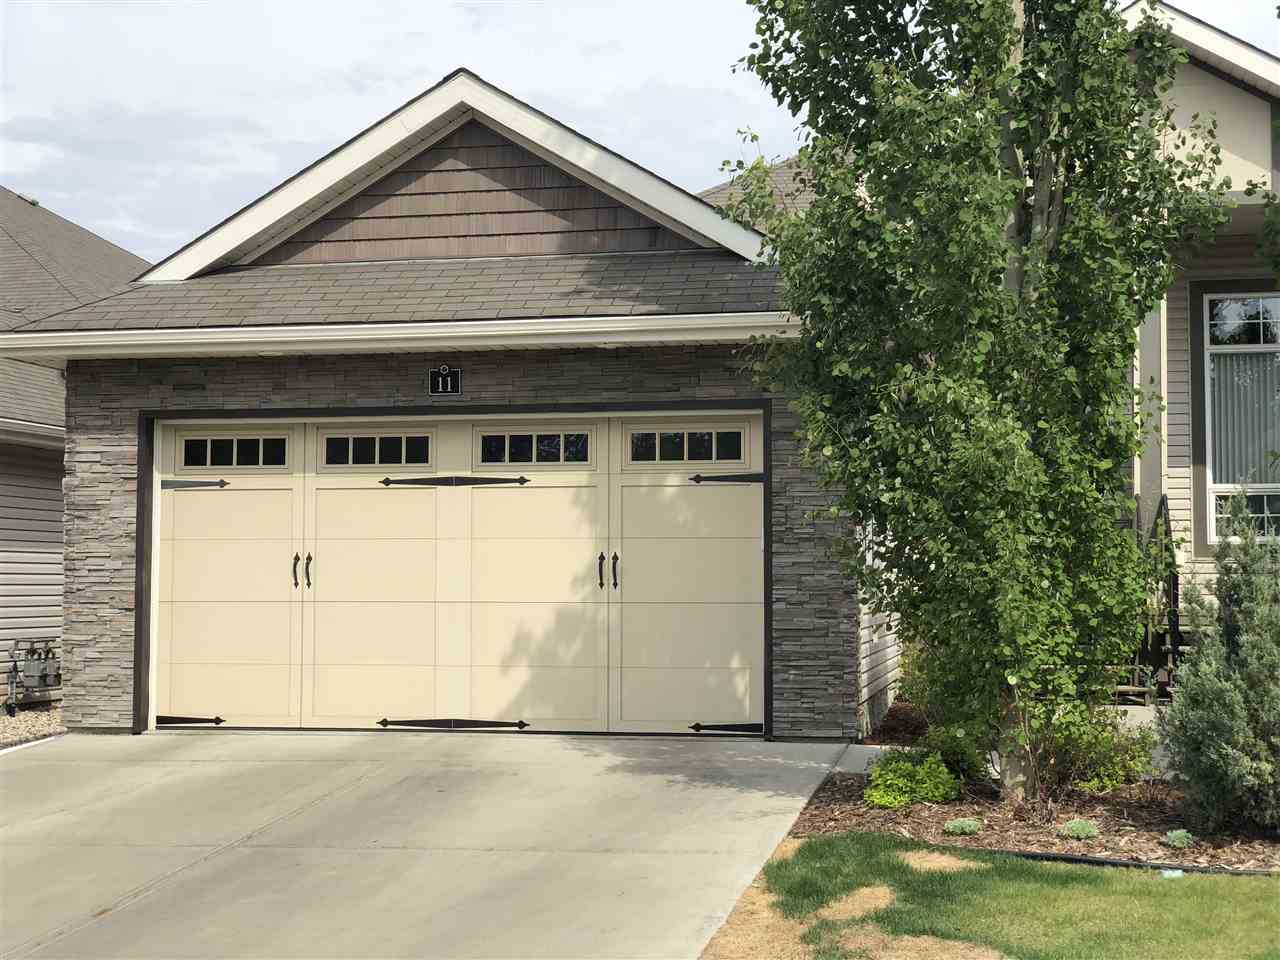 11 400 Jim Common Drive, 2 bed, 2.1 bath, at $524,900